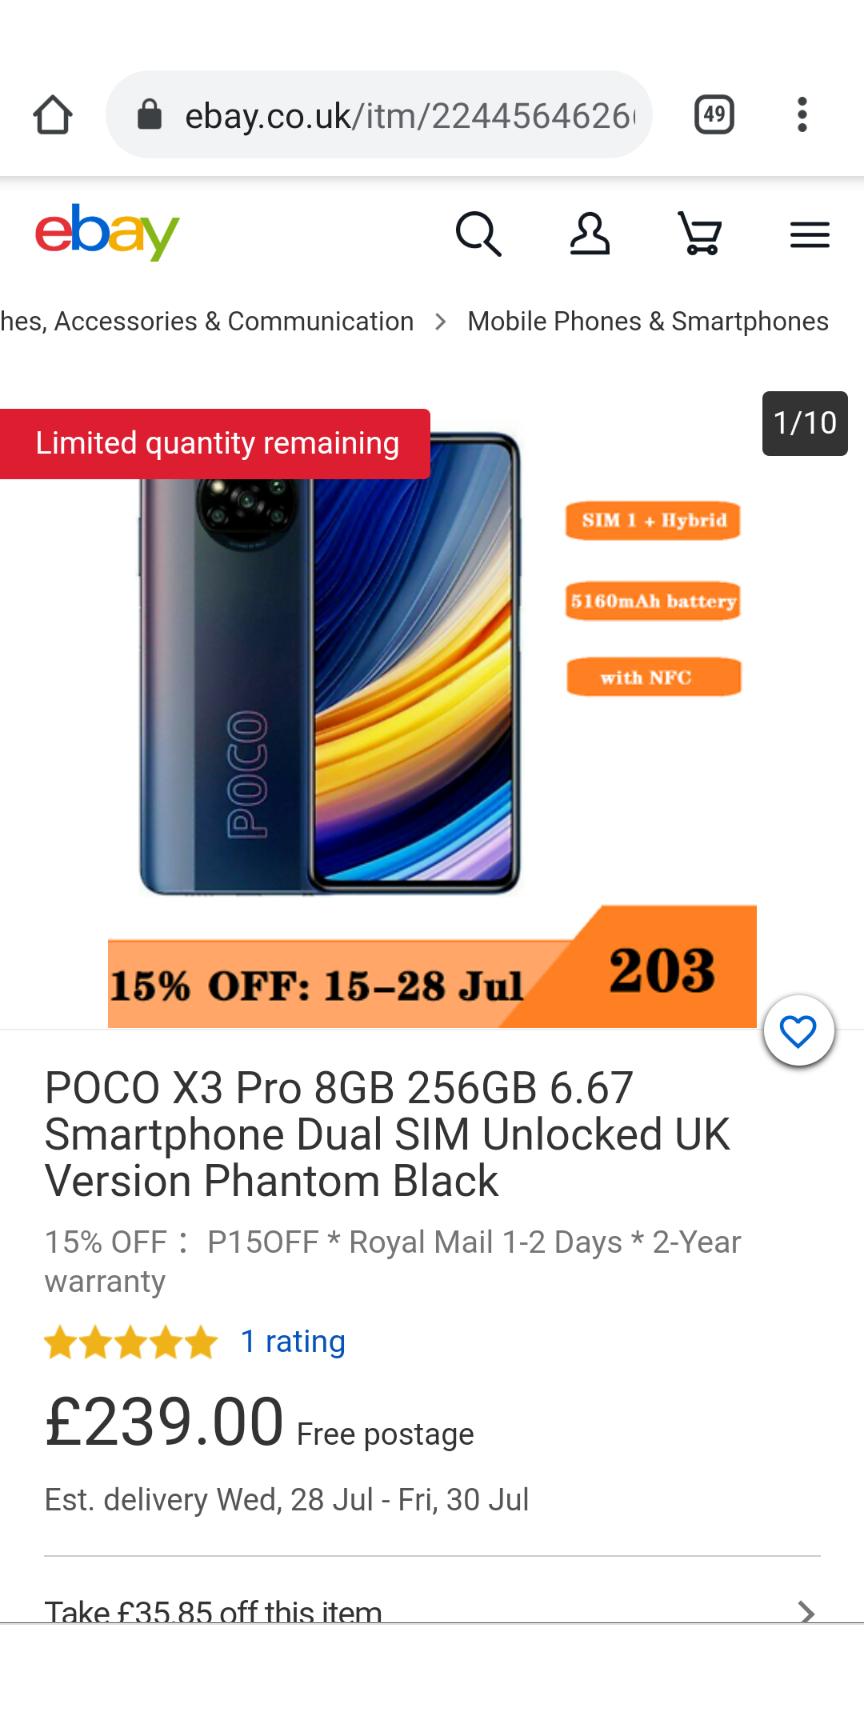 POCO X3 Pro 8GB 256GB 6.67 Smartphone Dual SIM Unlocked UK Version £203.15 at ebay xiaomi-uk OR £189 on xiaomi UK site (LINK IN DESCRIPTION)